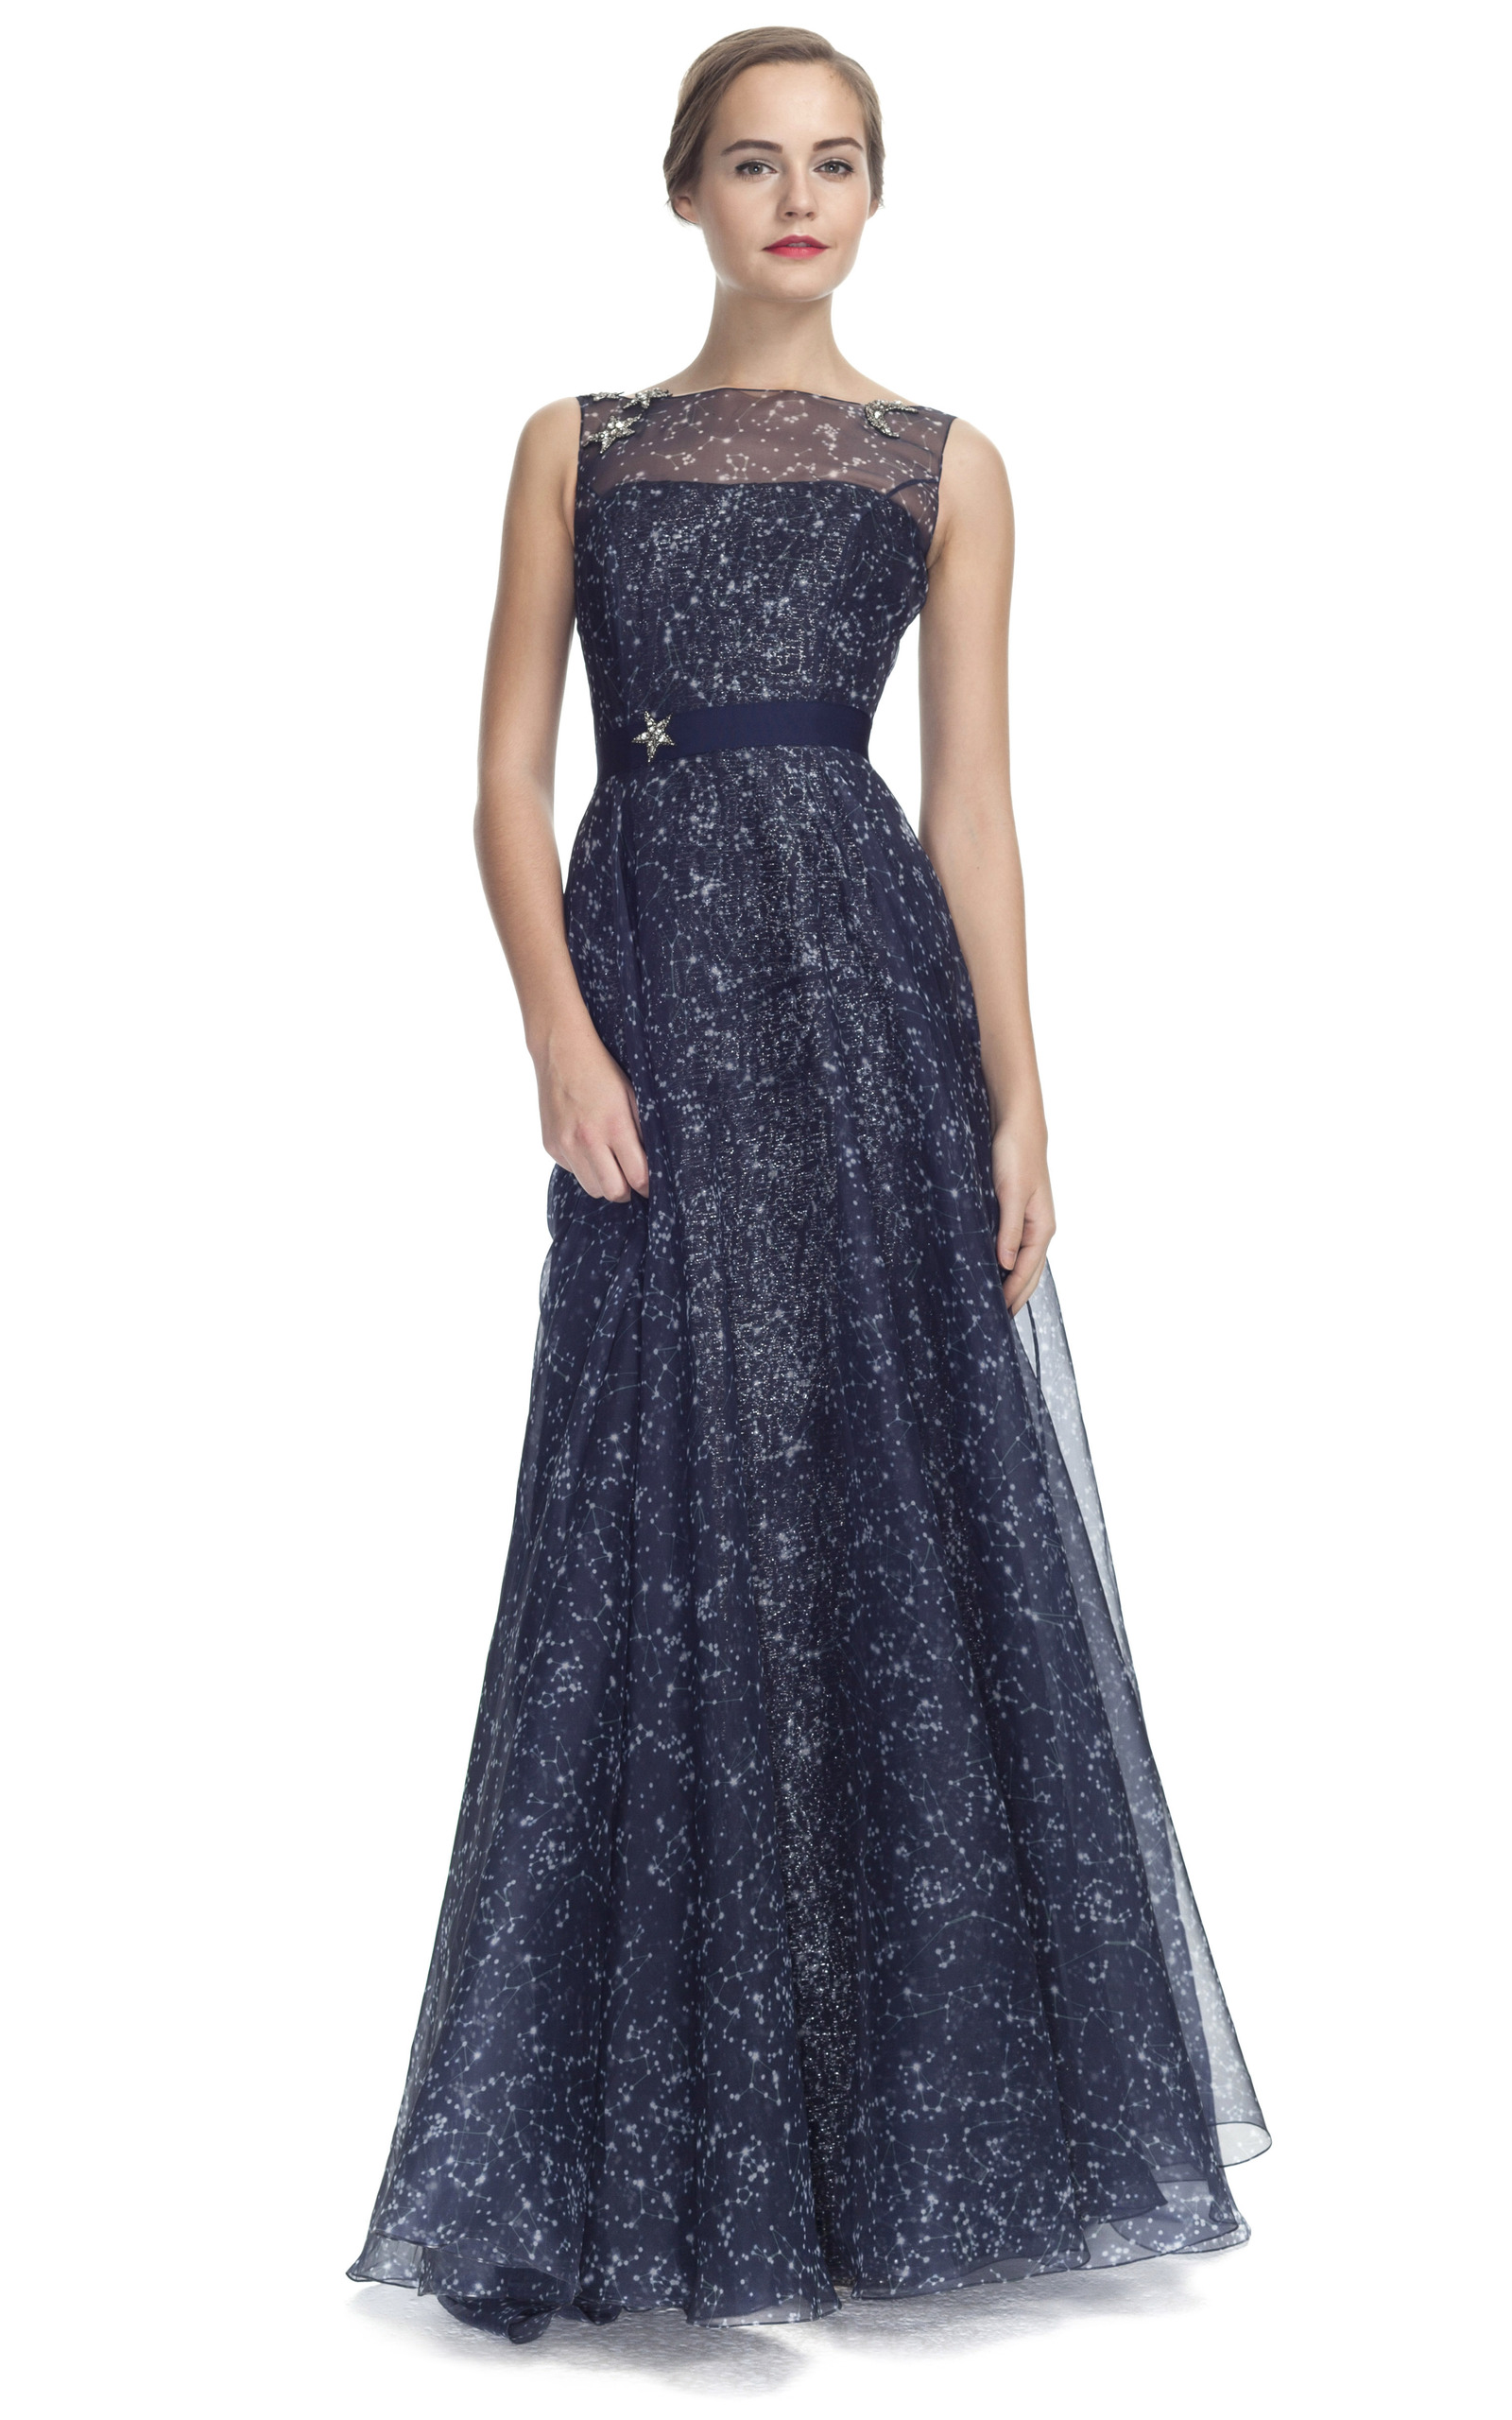 Constellation Organza Sleeveless Gown by Carolina | Moda Operandi